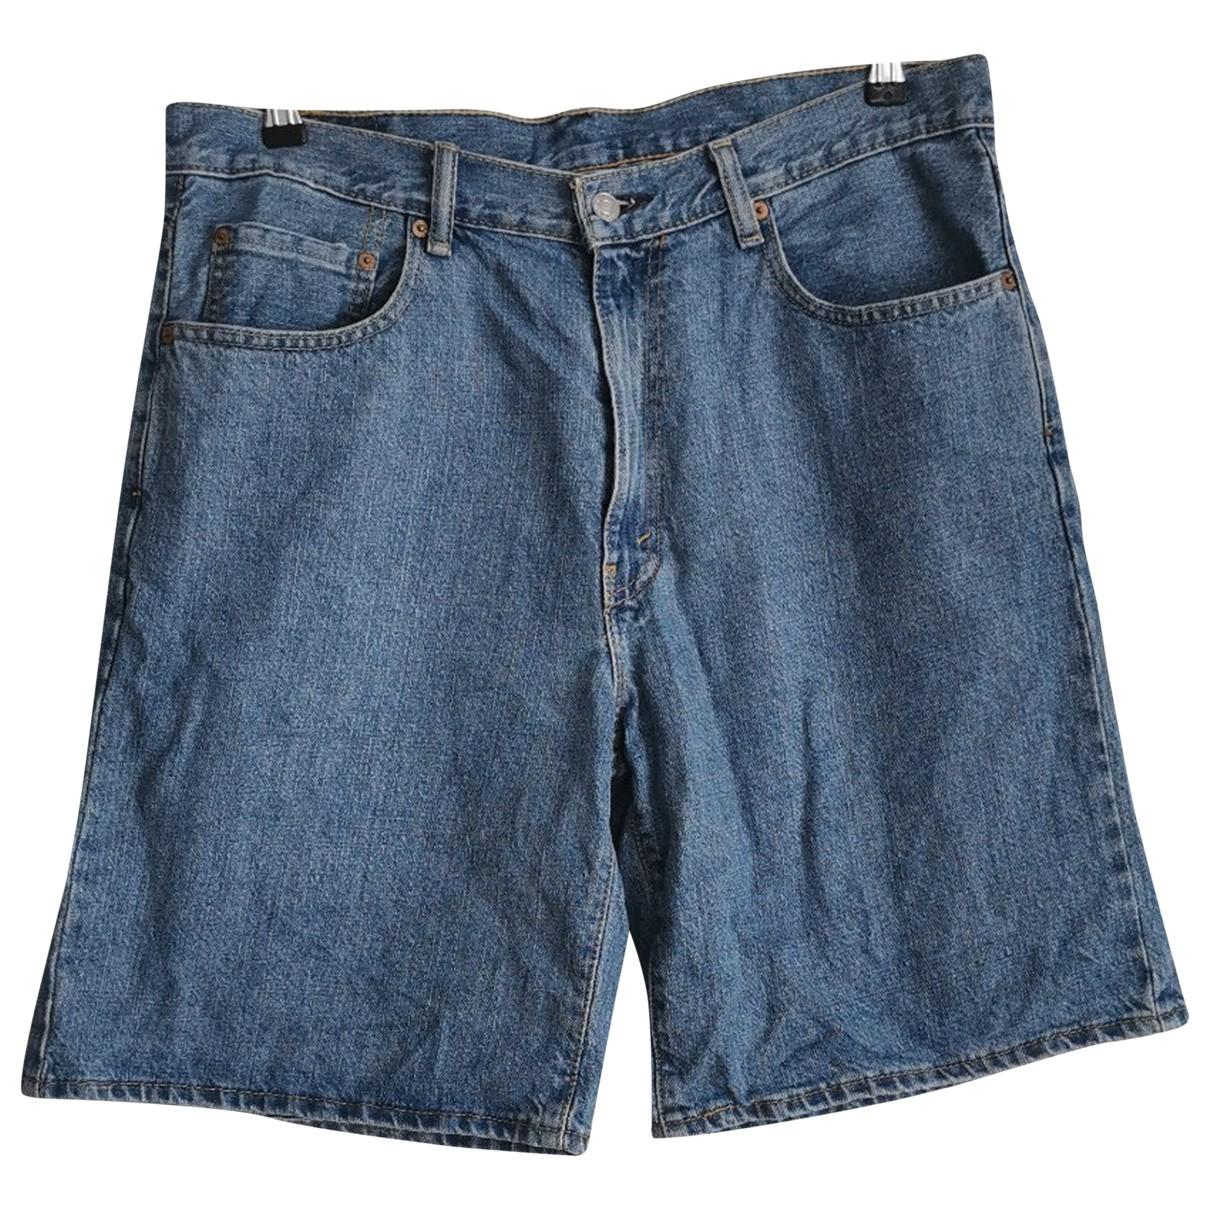 Levi's N Blue Denim - Jeans Shorts for Men 36 UK - US